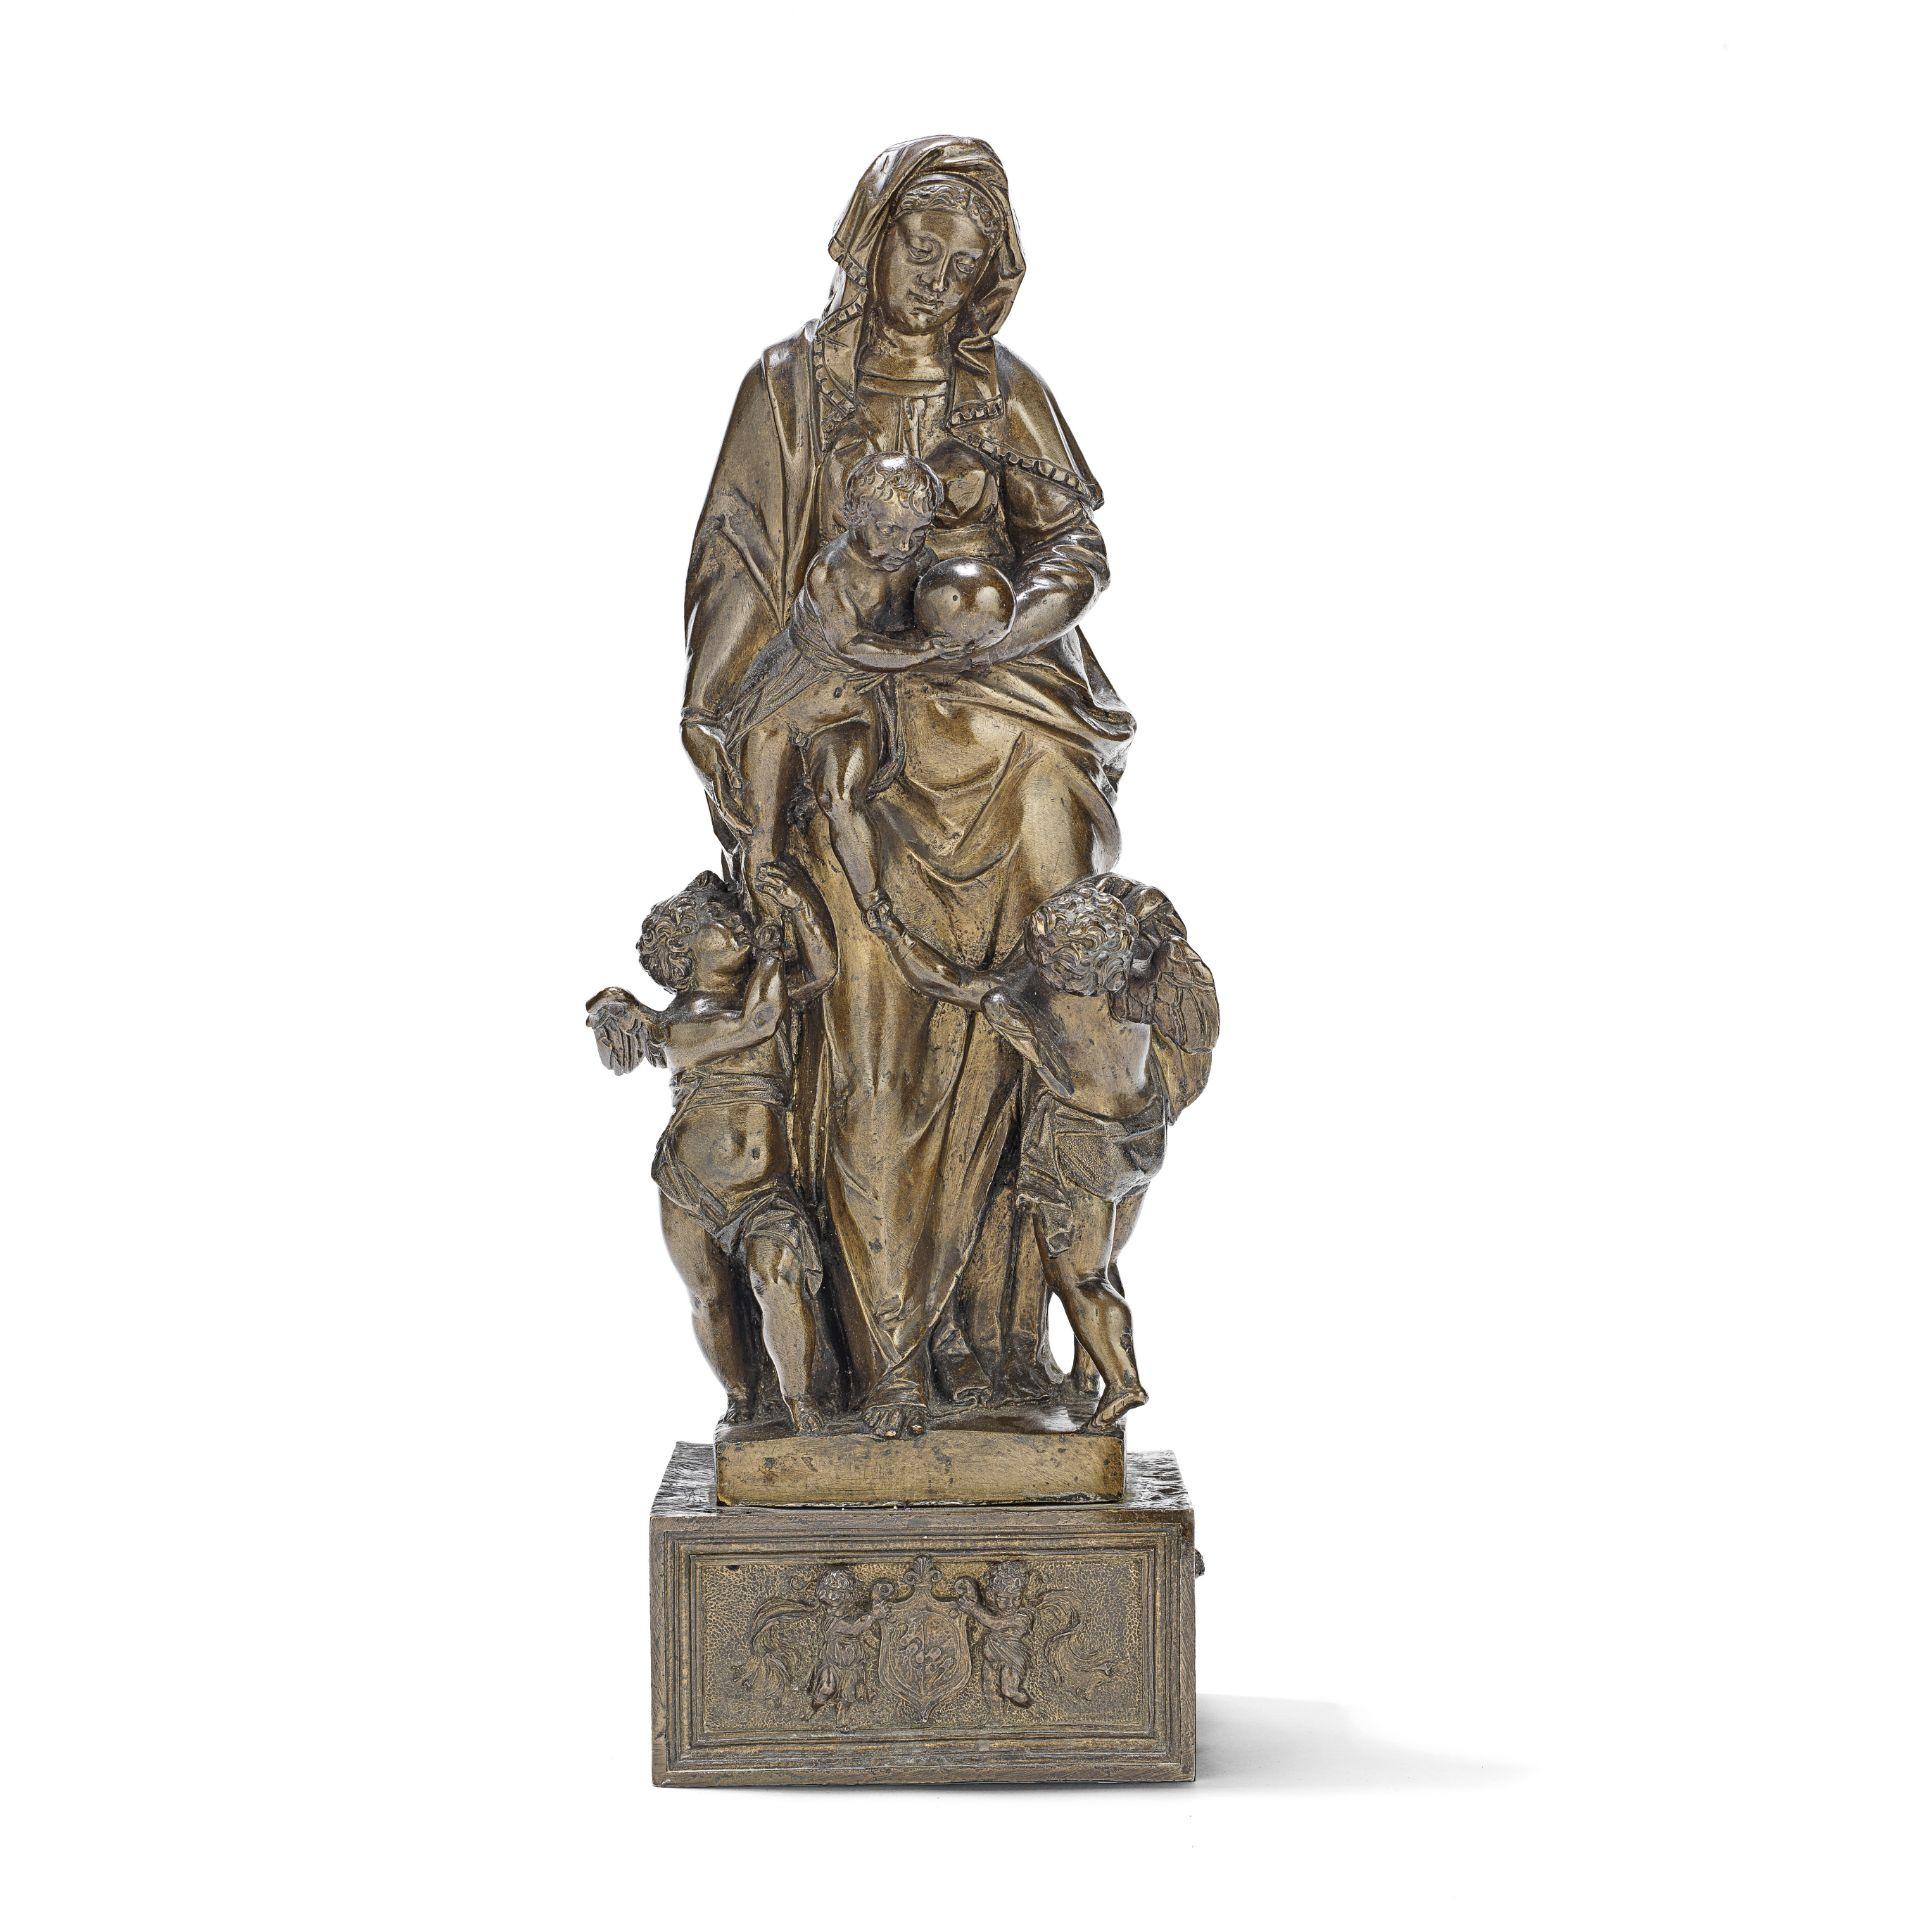 Workshop of Sebastiano Nicolino (Italian, active early/mid 17th century): A patinated bronze figu...